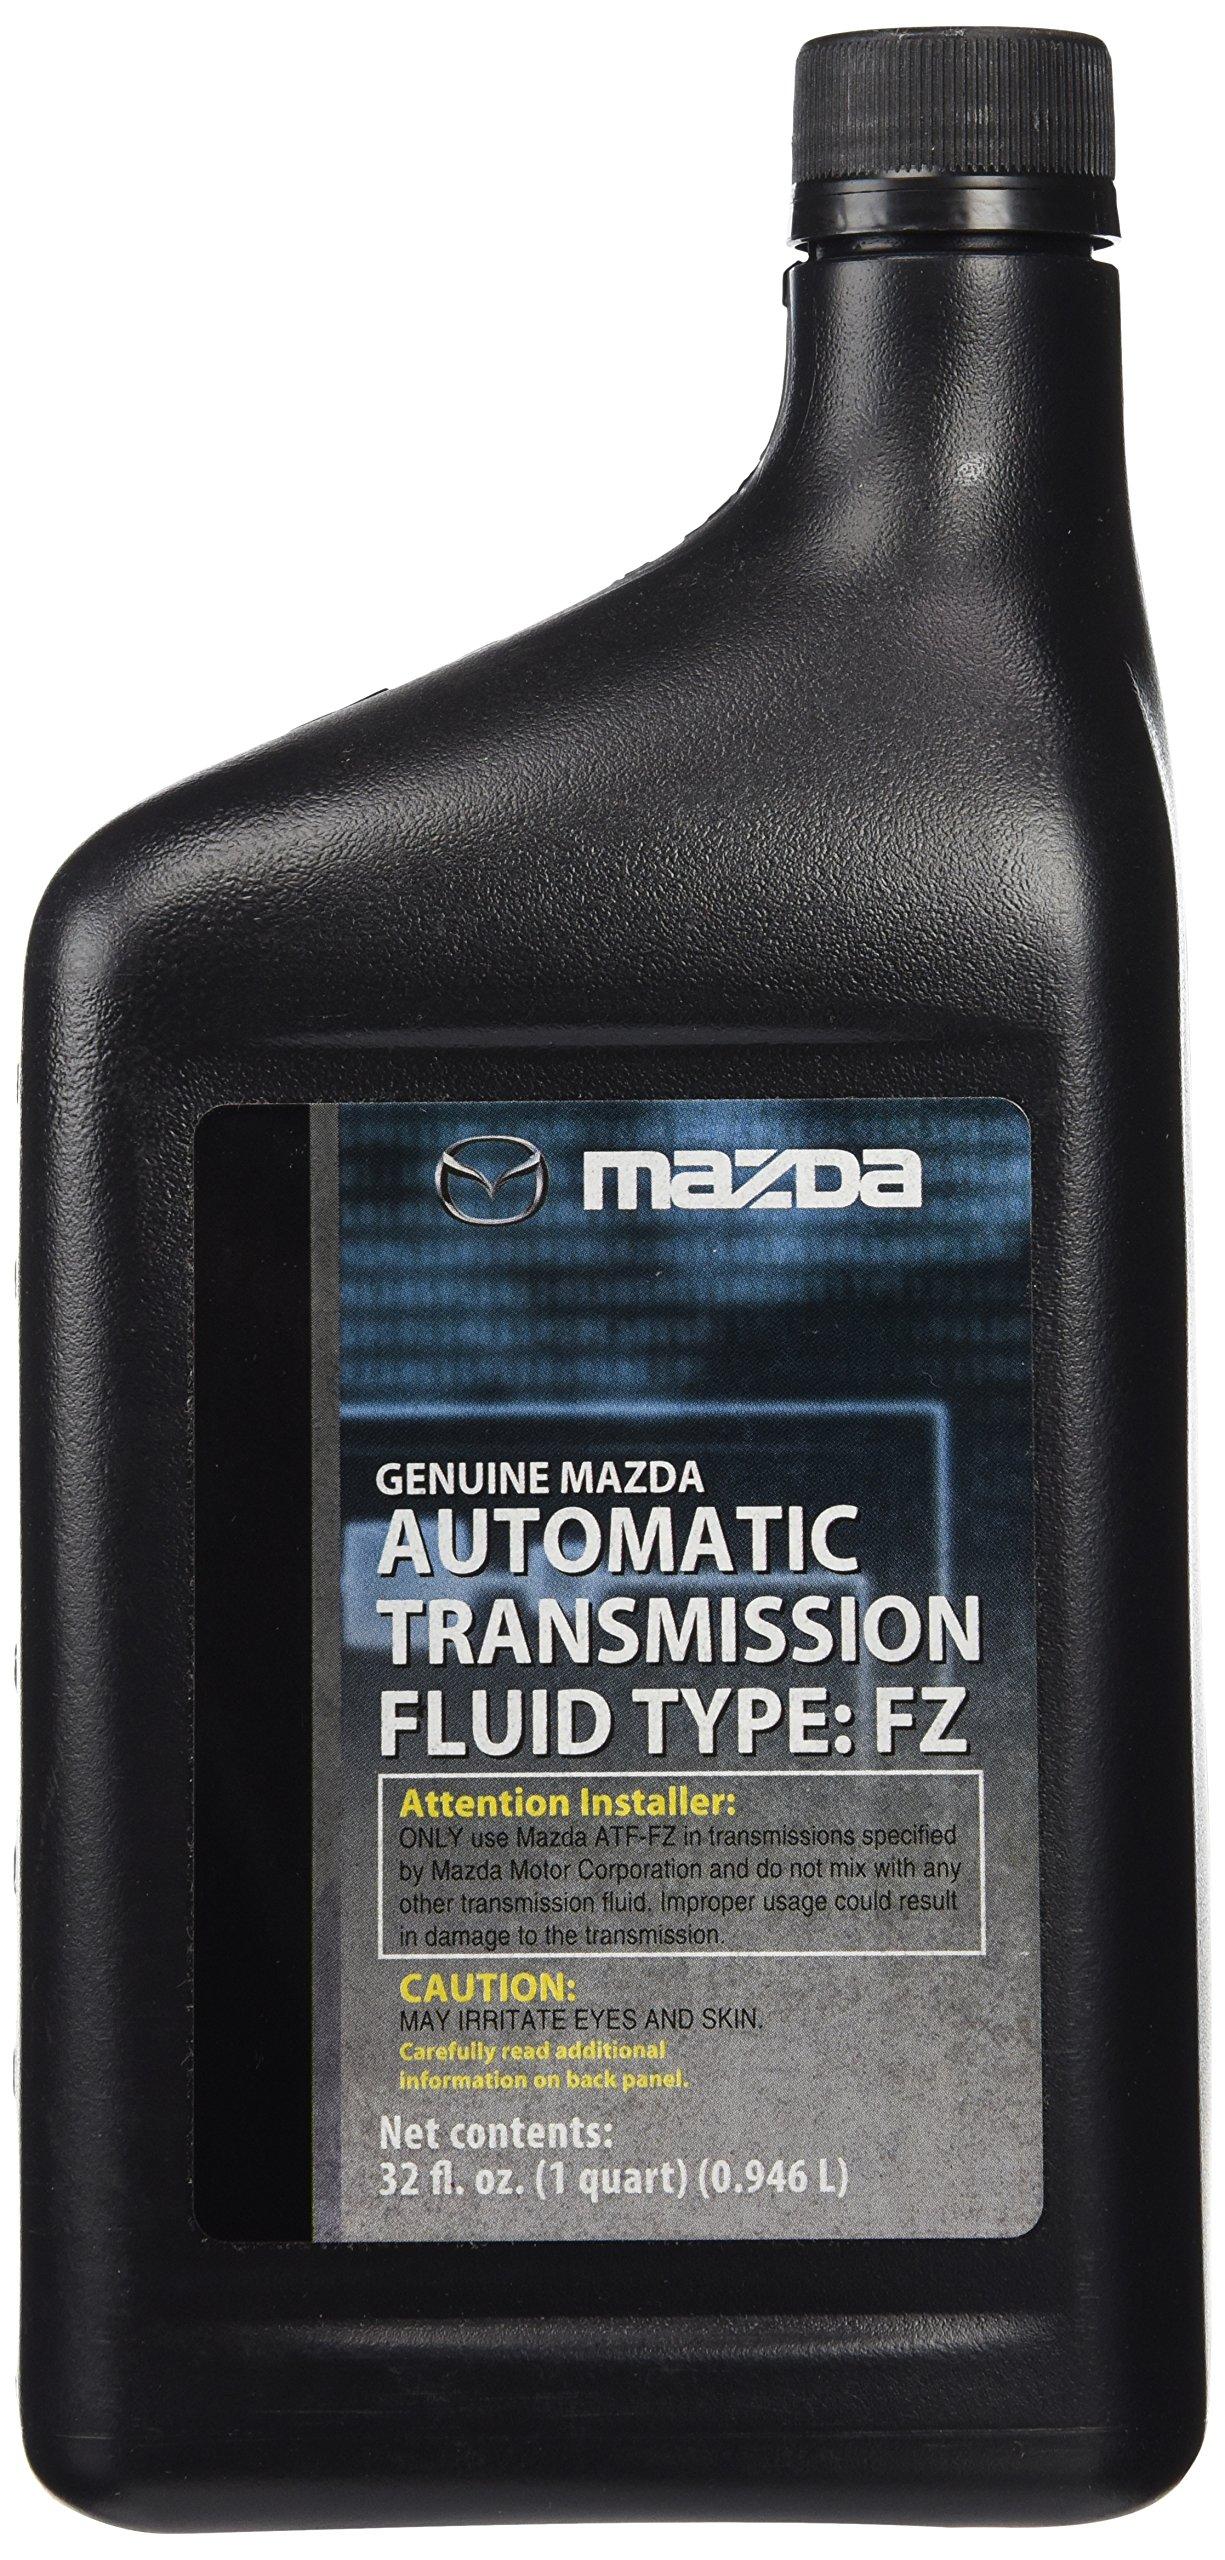 Mazda Genuine (0000-FZ-113E-01) Automatic Transmission Fluid, 32 fl oz